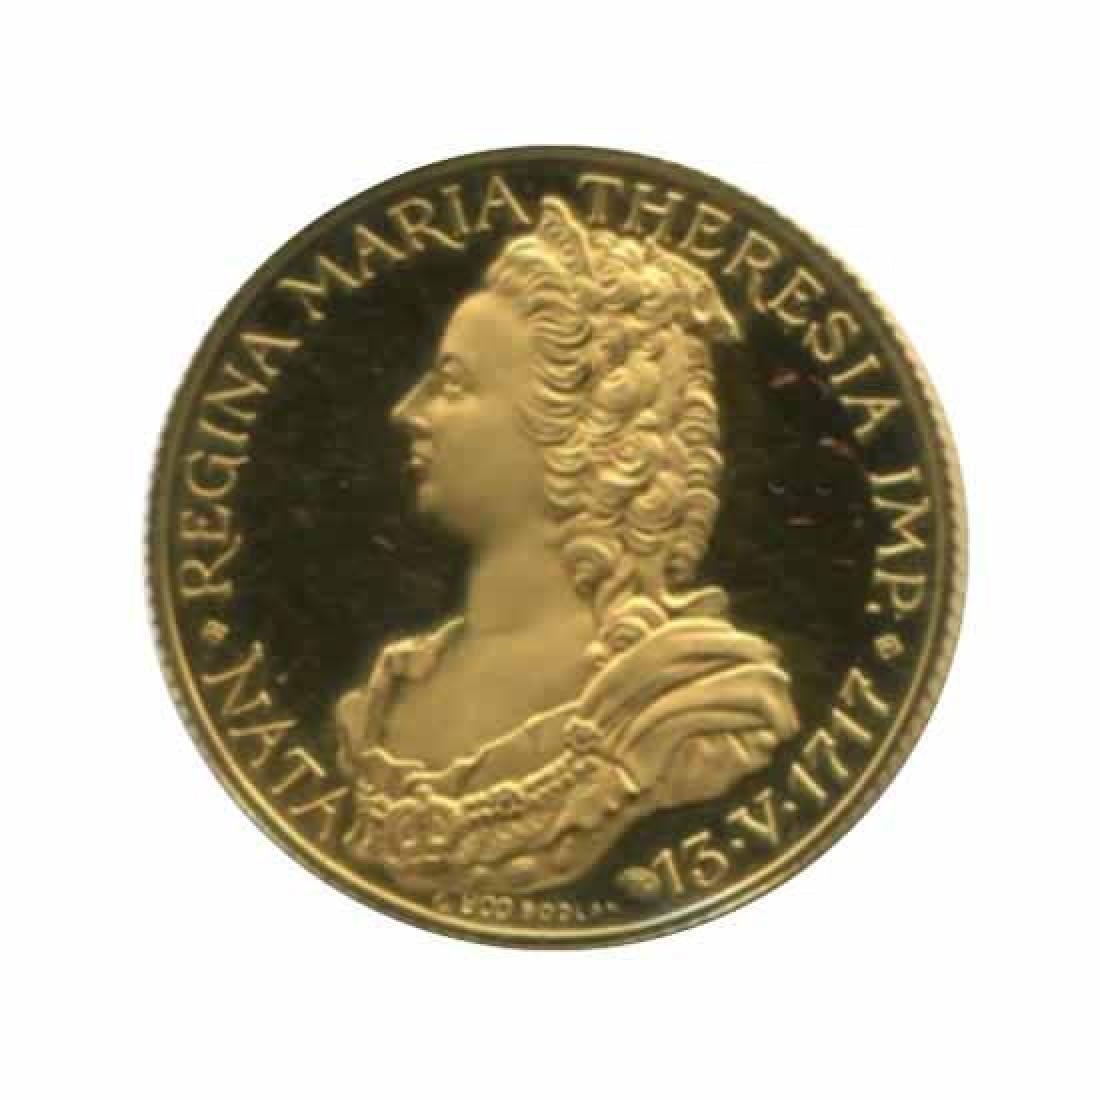 Maria Theresa 9.5g commemorative gold medal PF